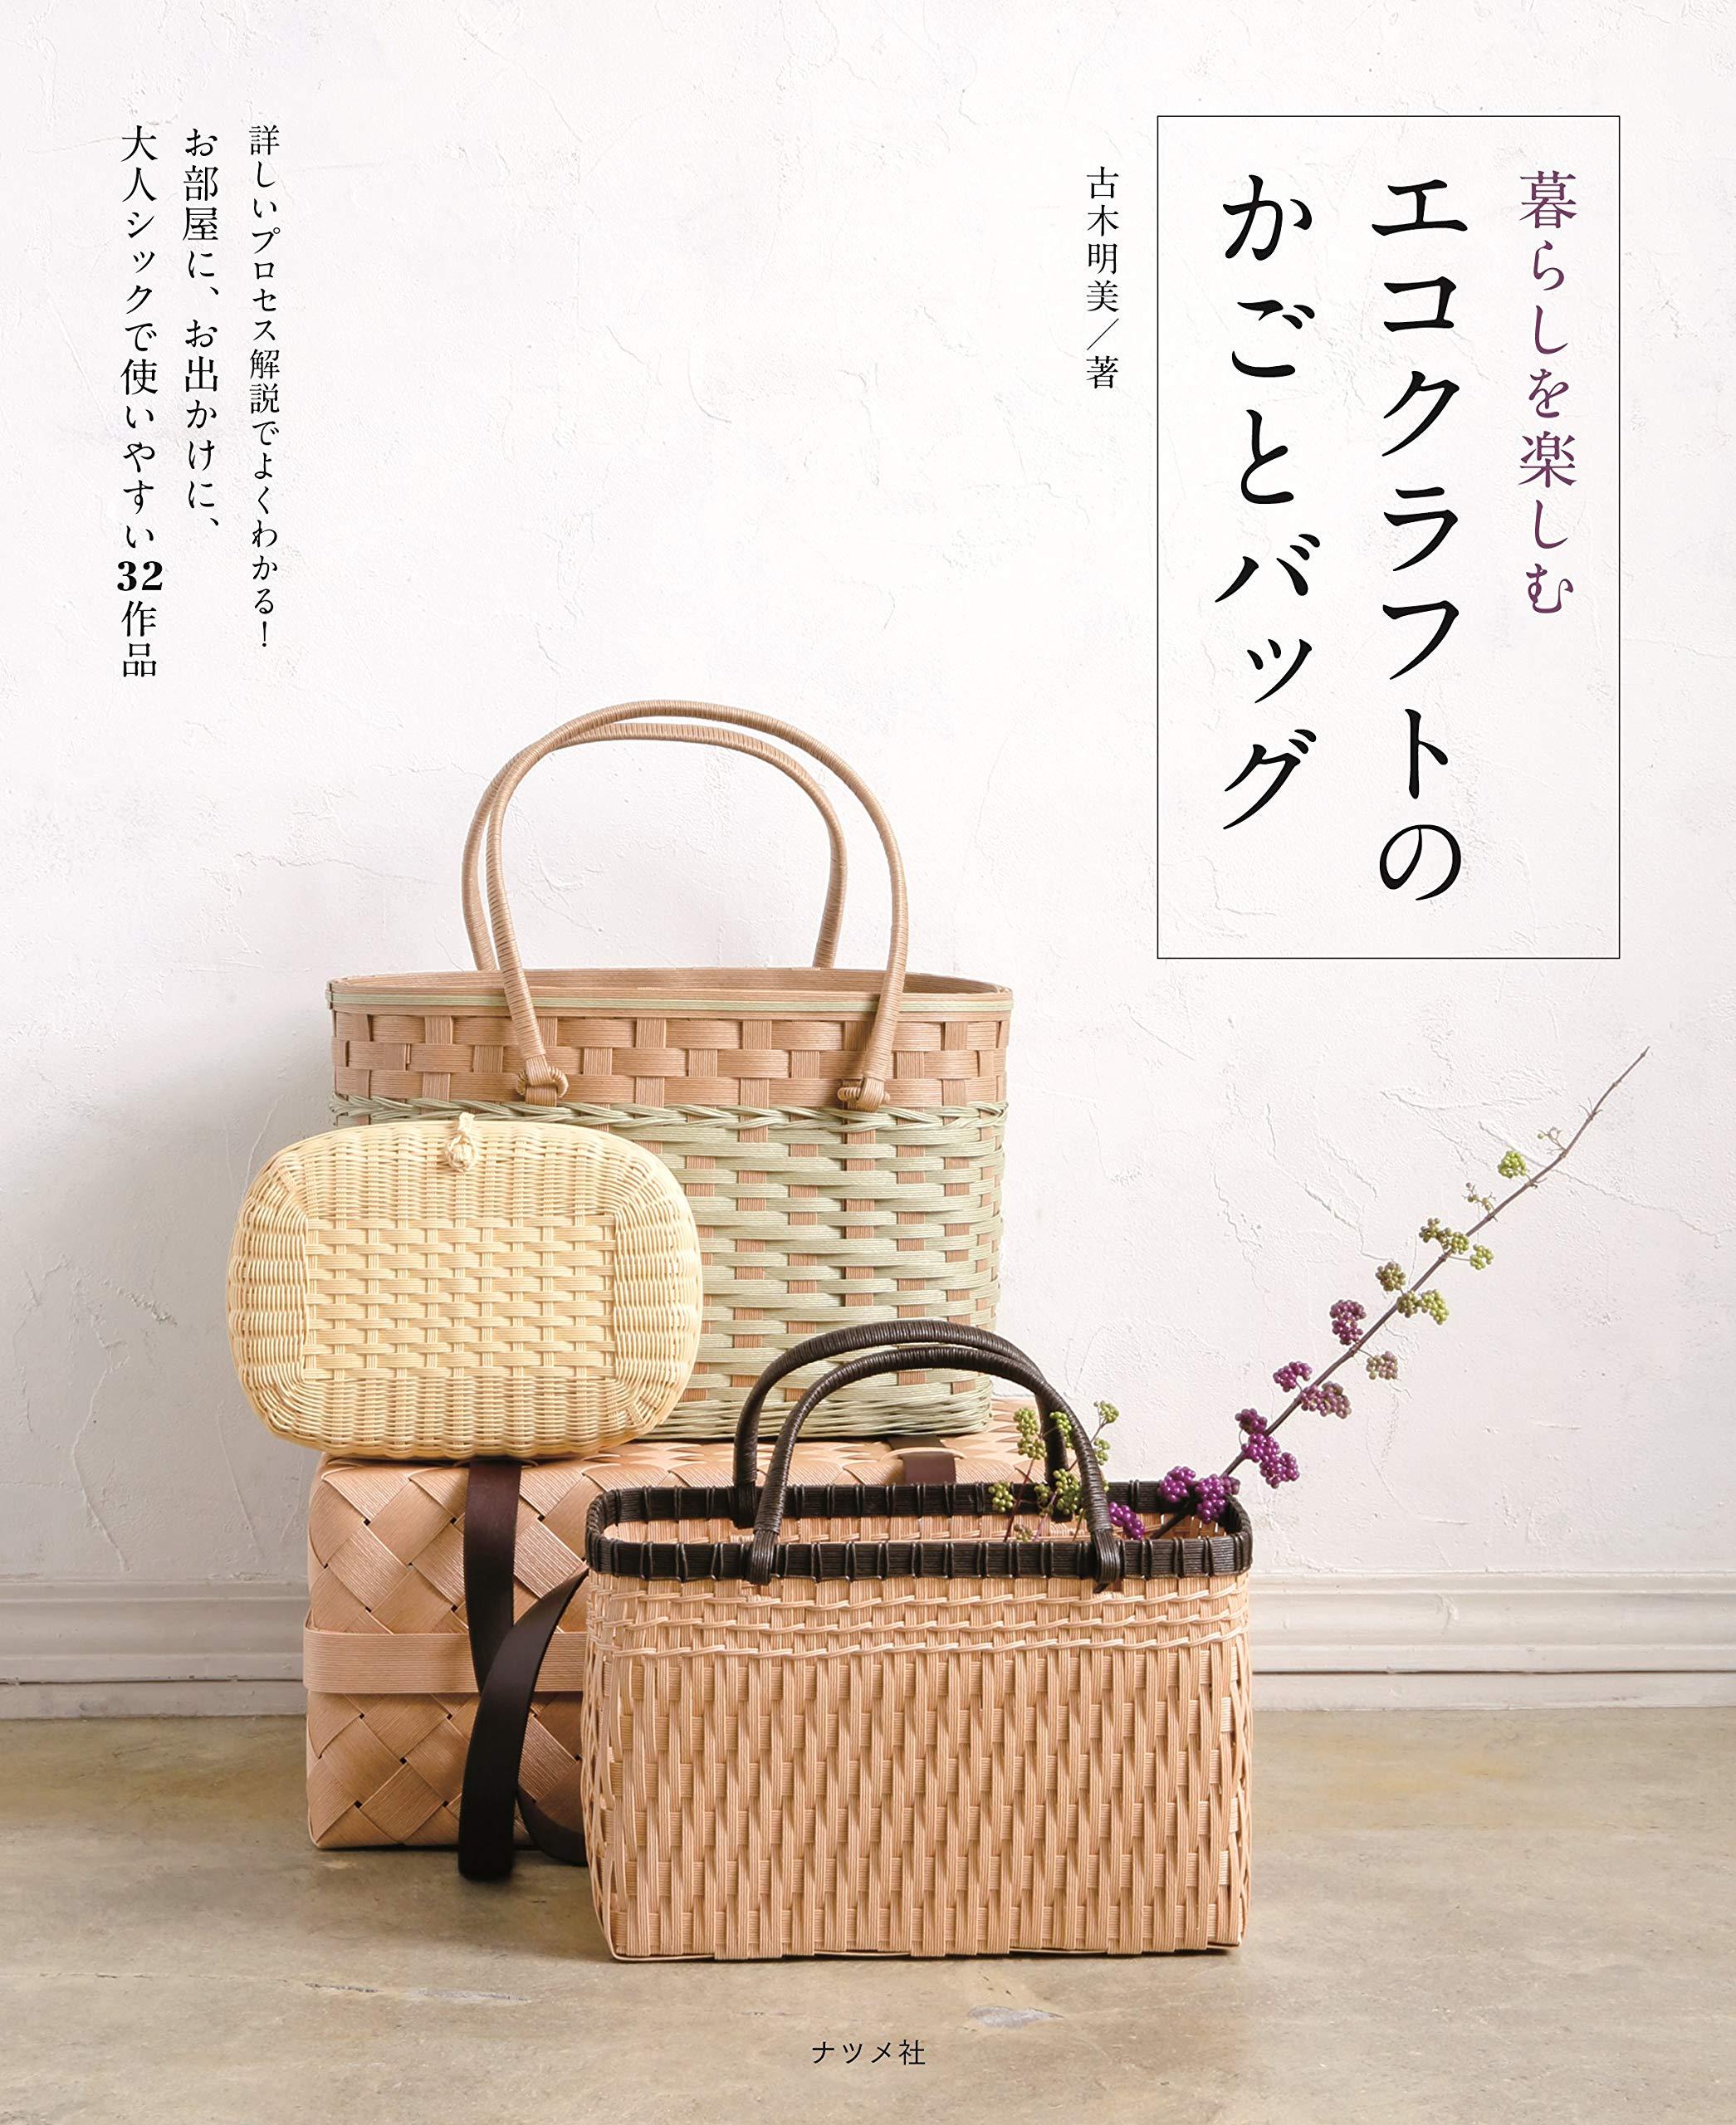 Enjoying life Eco-craft baskets and large bags